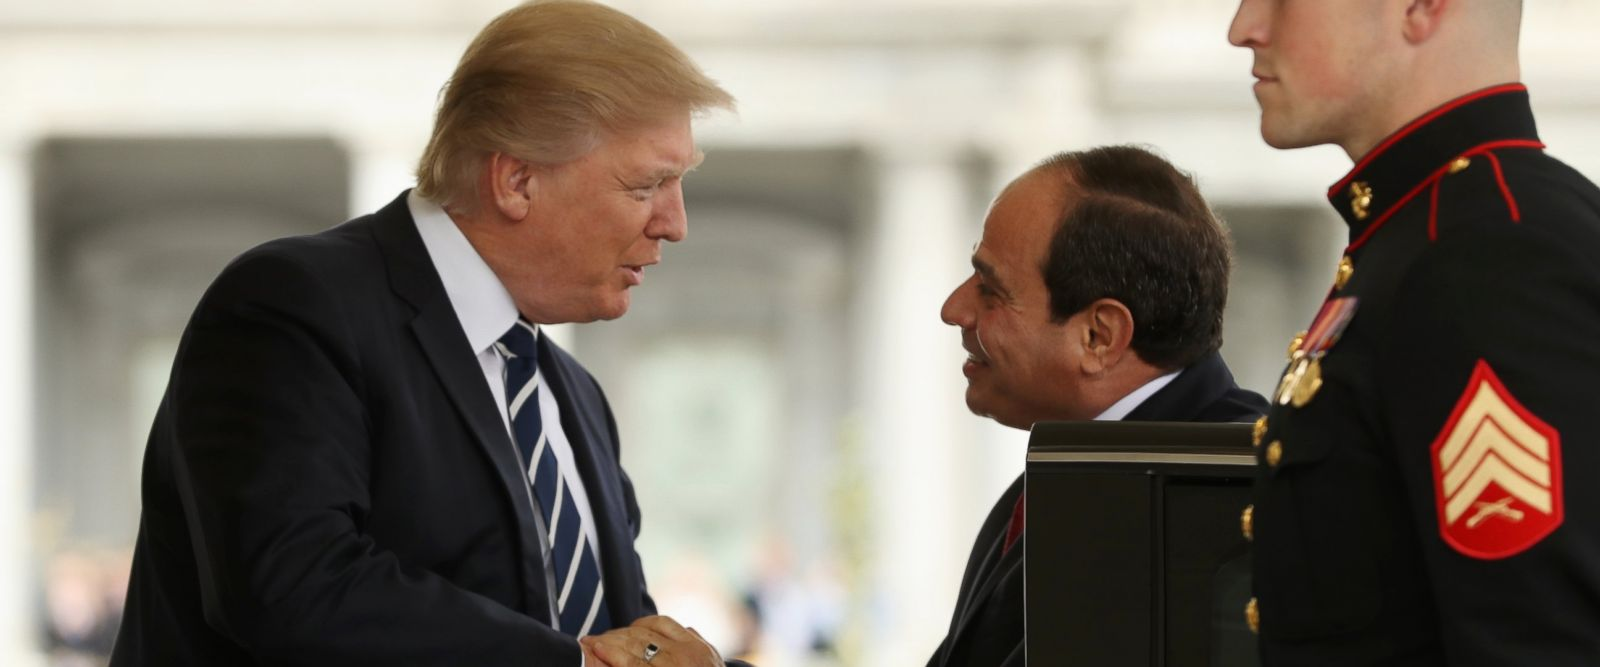 Trump-Egypt-Image